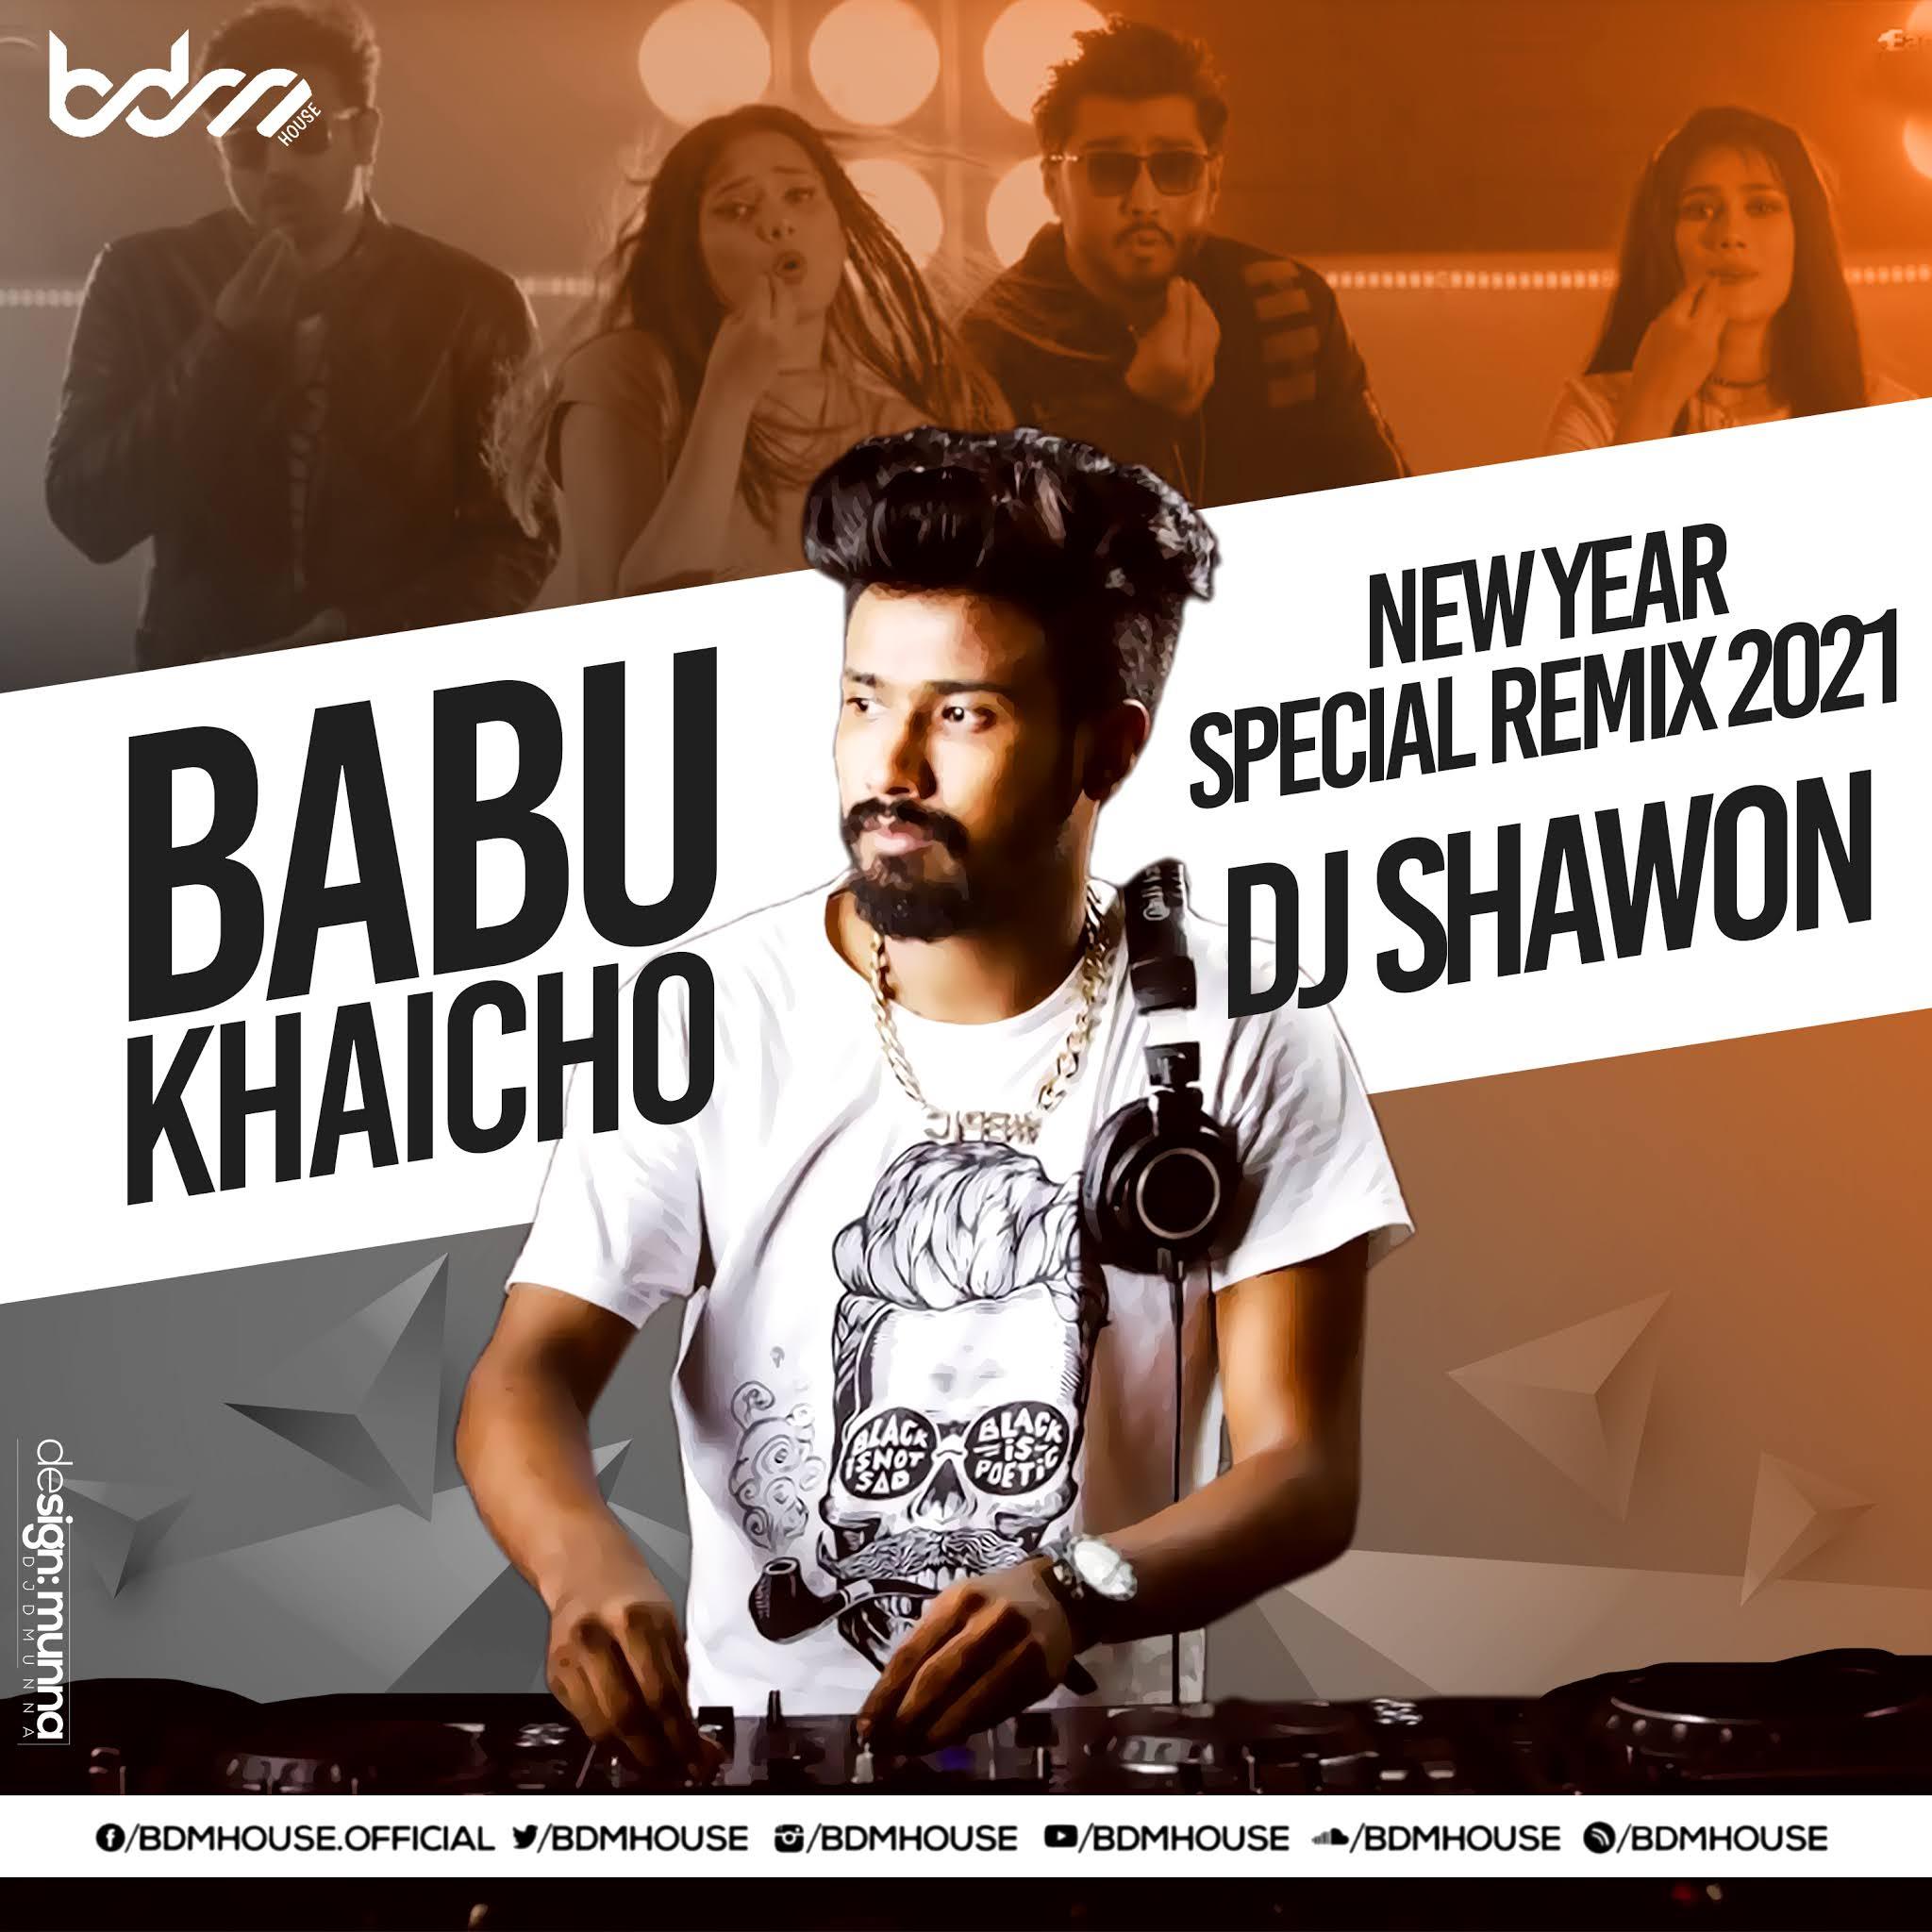 BABU KHAISO (NEW YEAR SPECIAL REMIX 2021) - DJ SHAWON